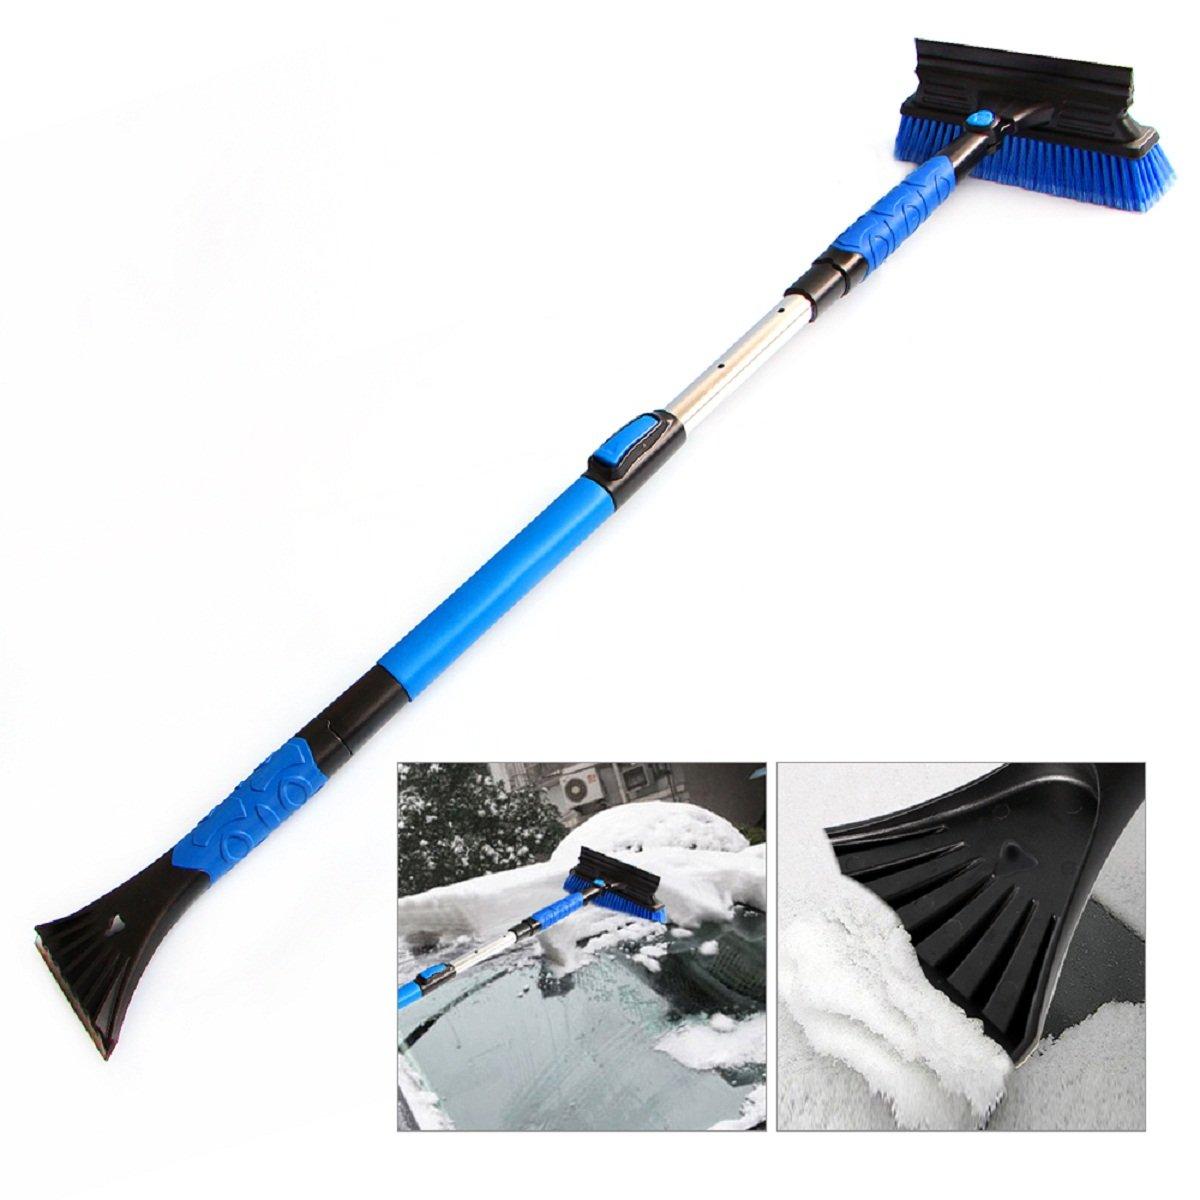 Amazon.com: R-Minas Retractable Handle Snow Shovel Snow Brush Car: Automotive